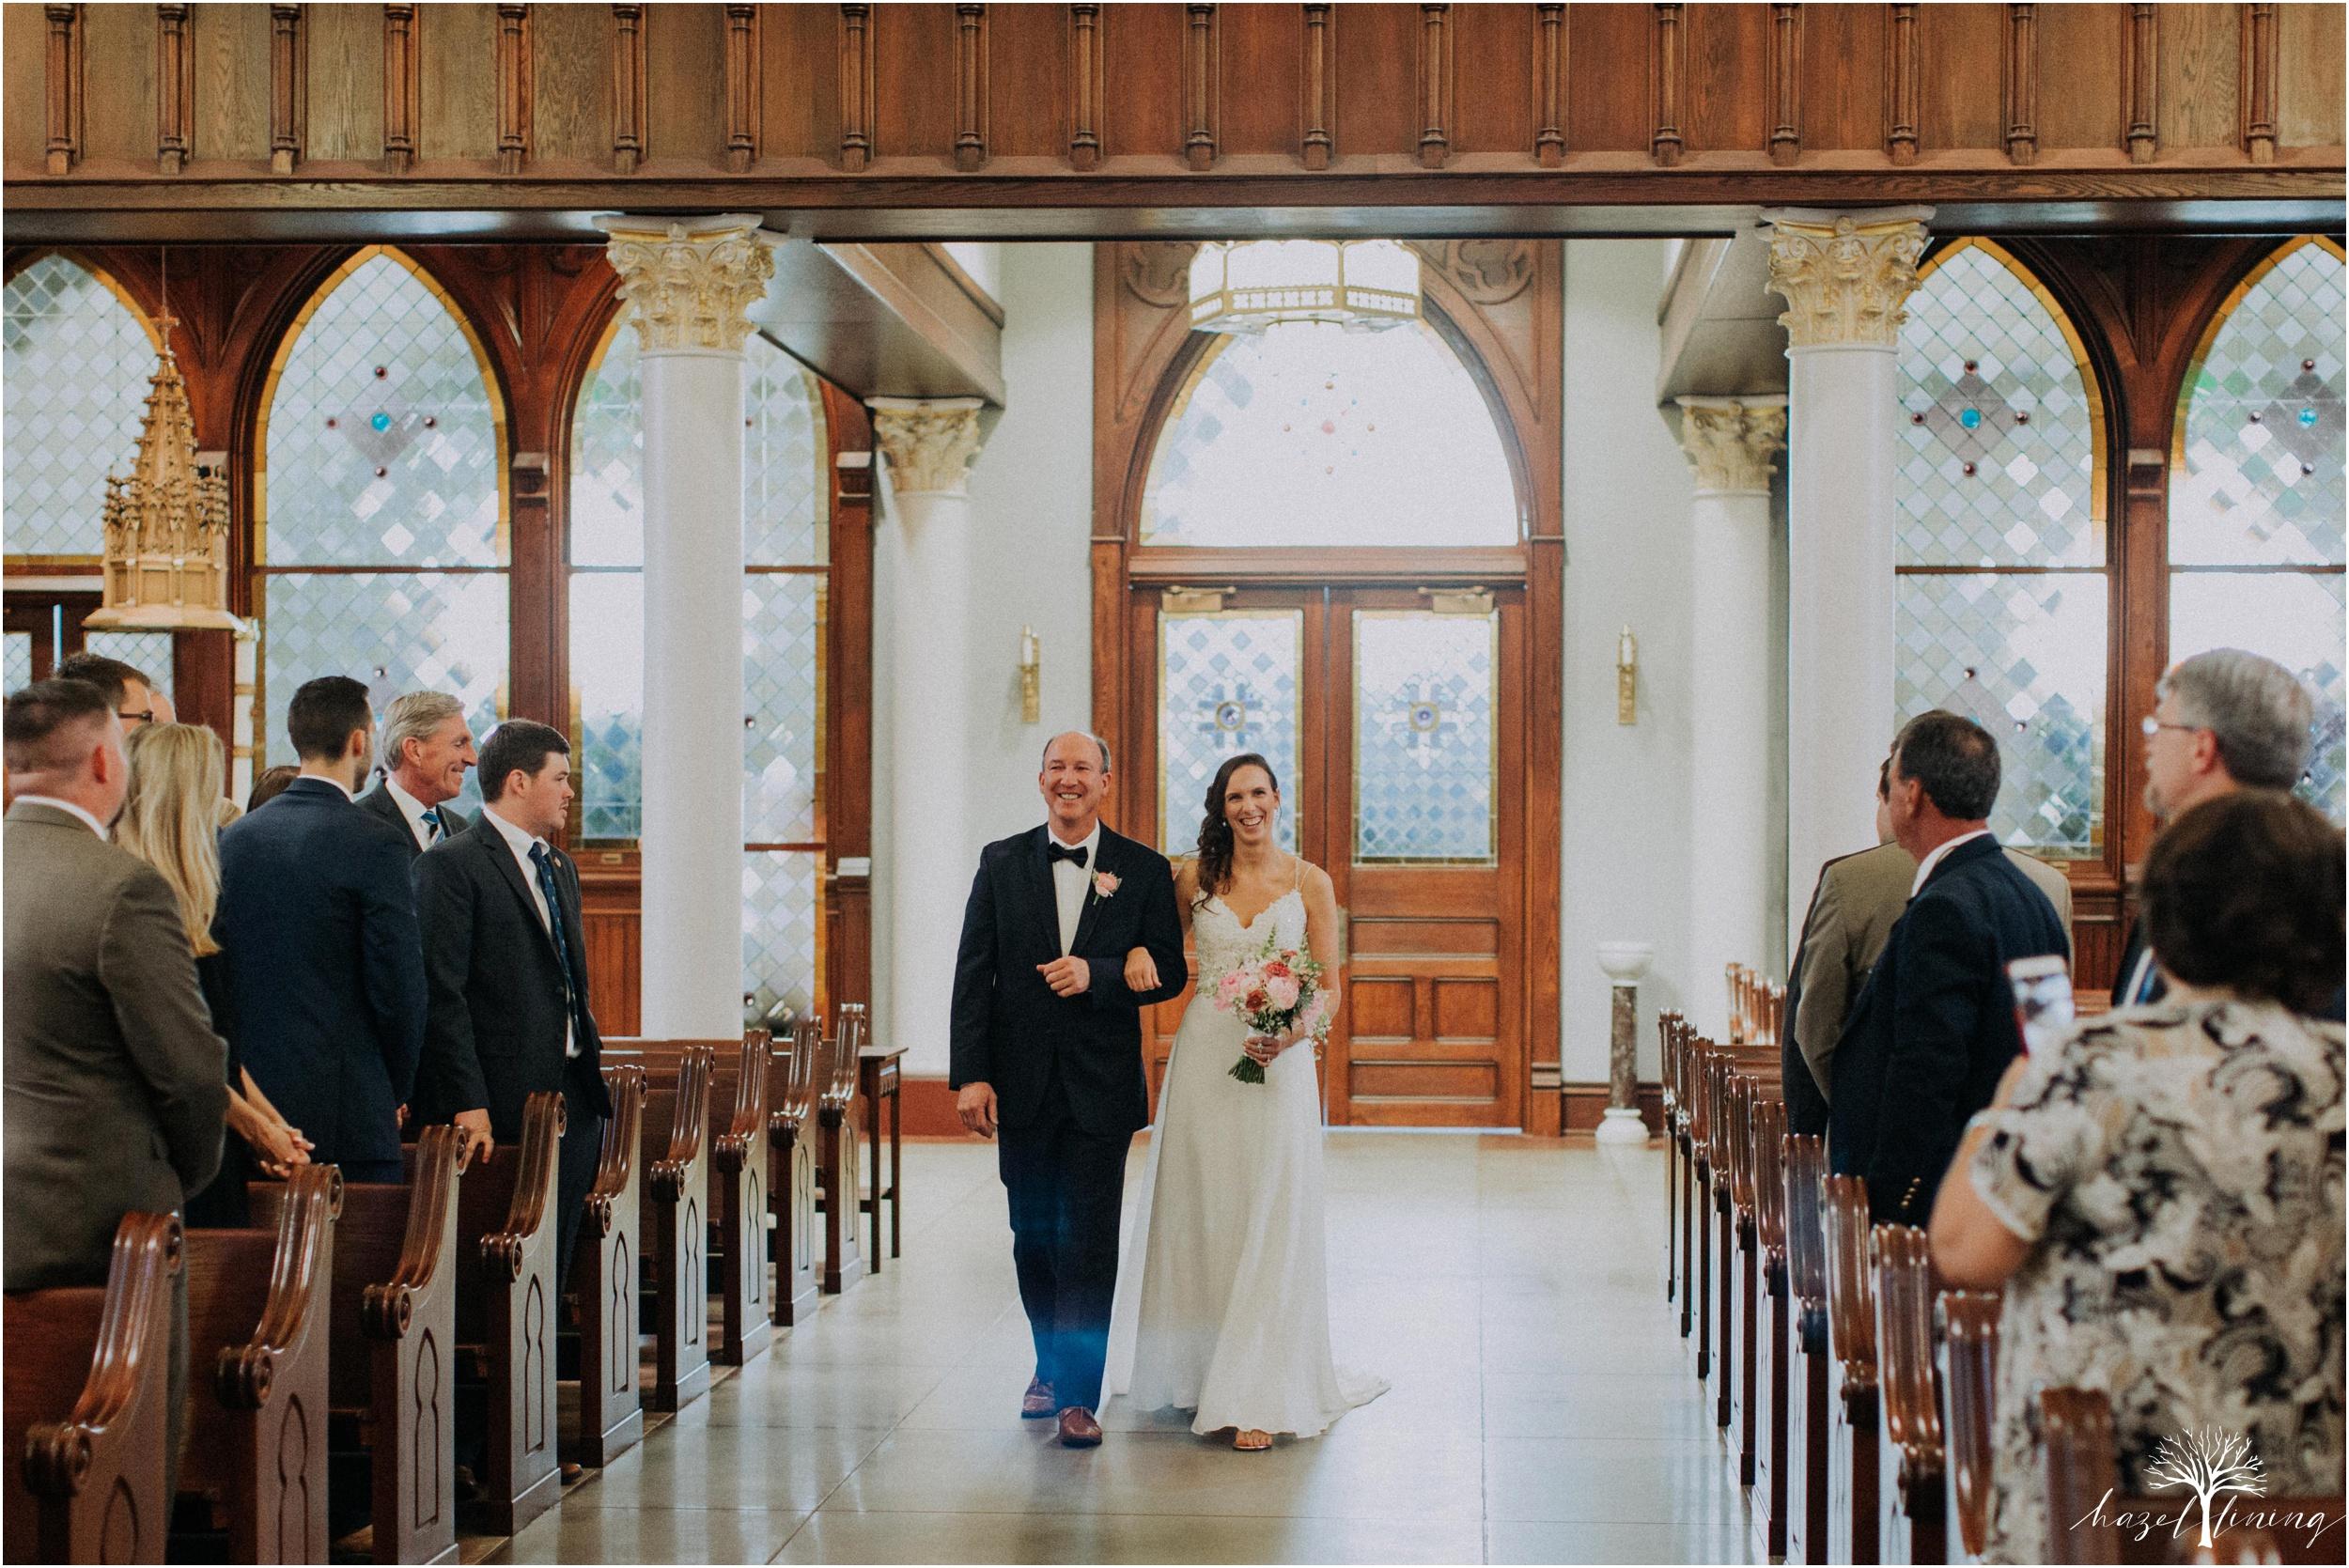 hazel-lining-travel-wedding-elopement-photography_0049.jpg